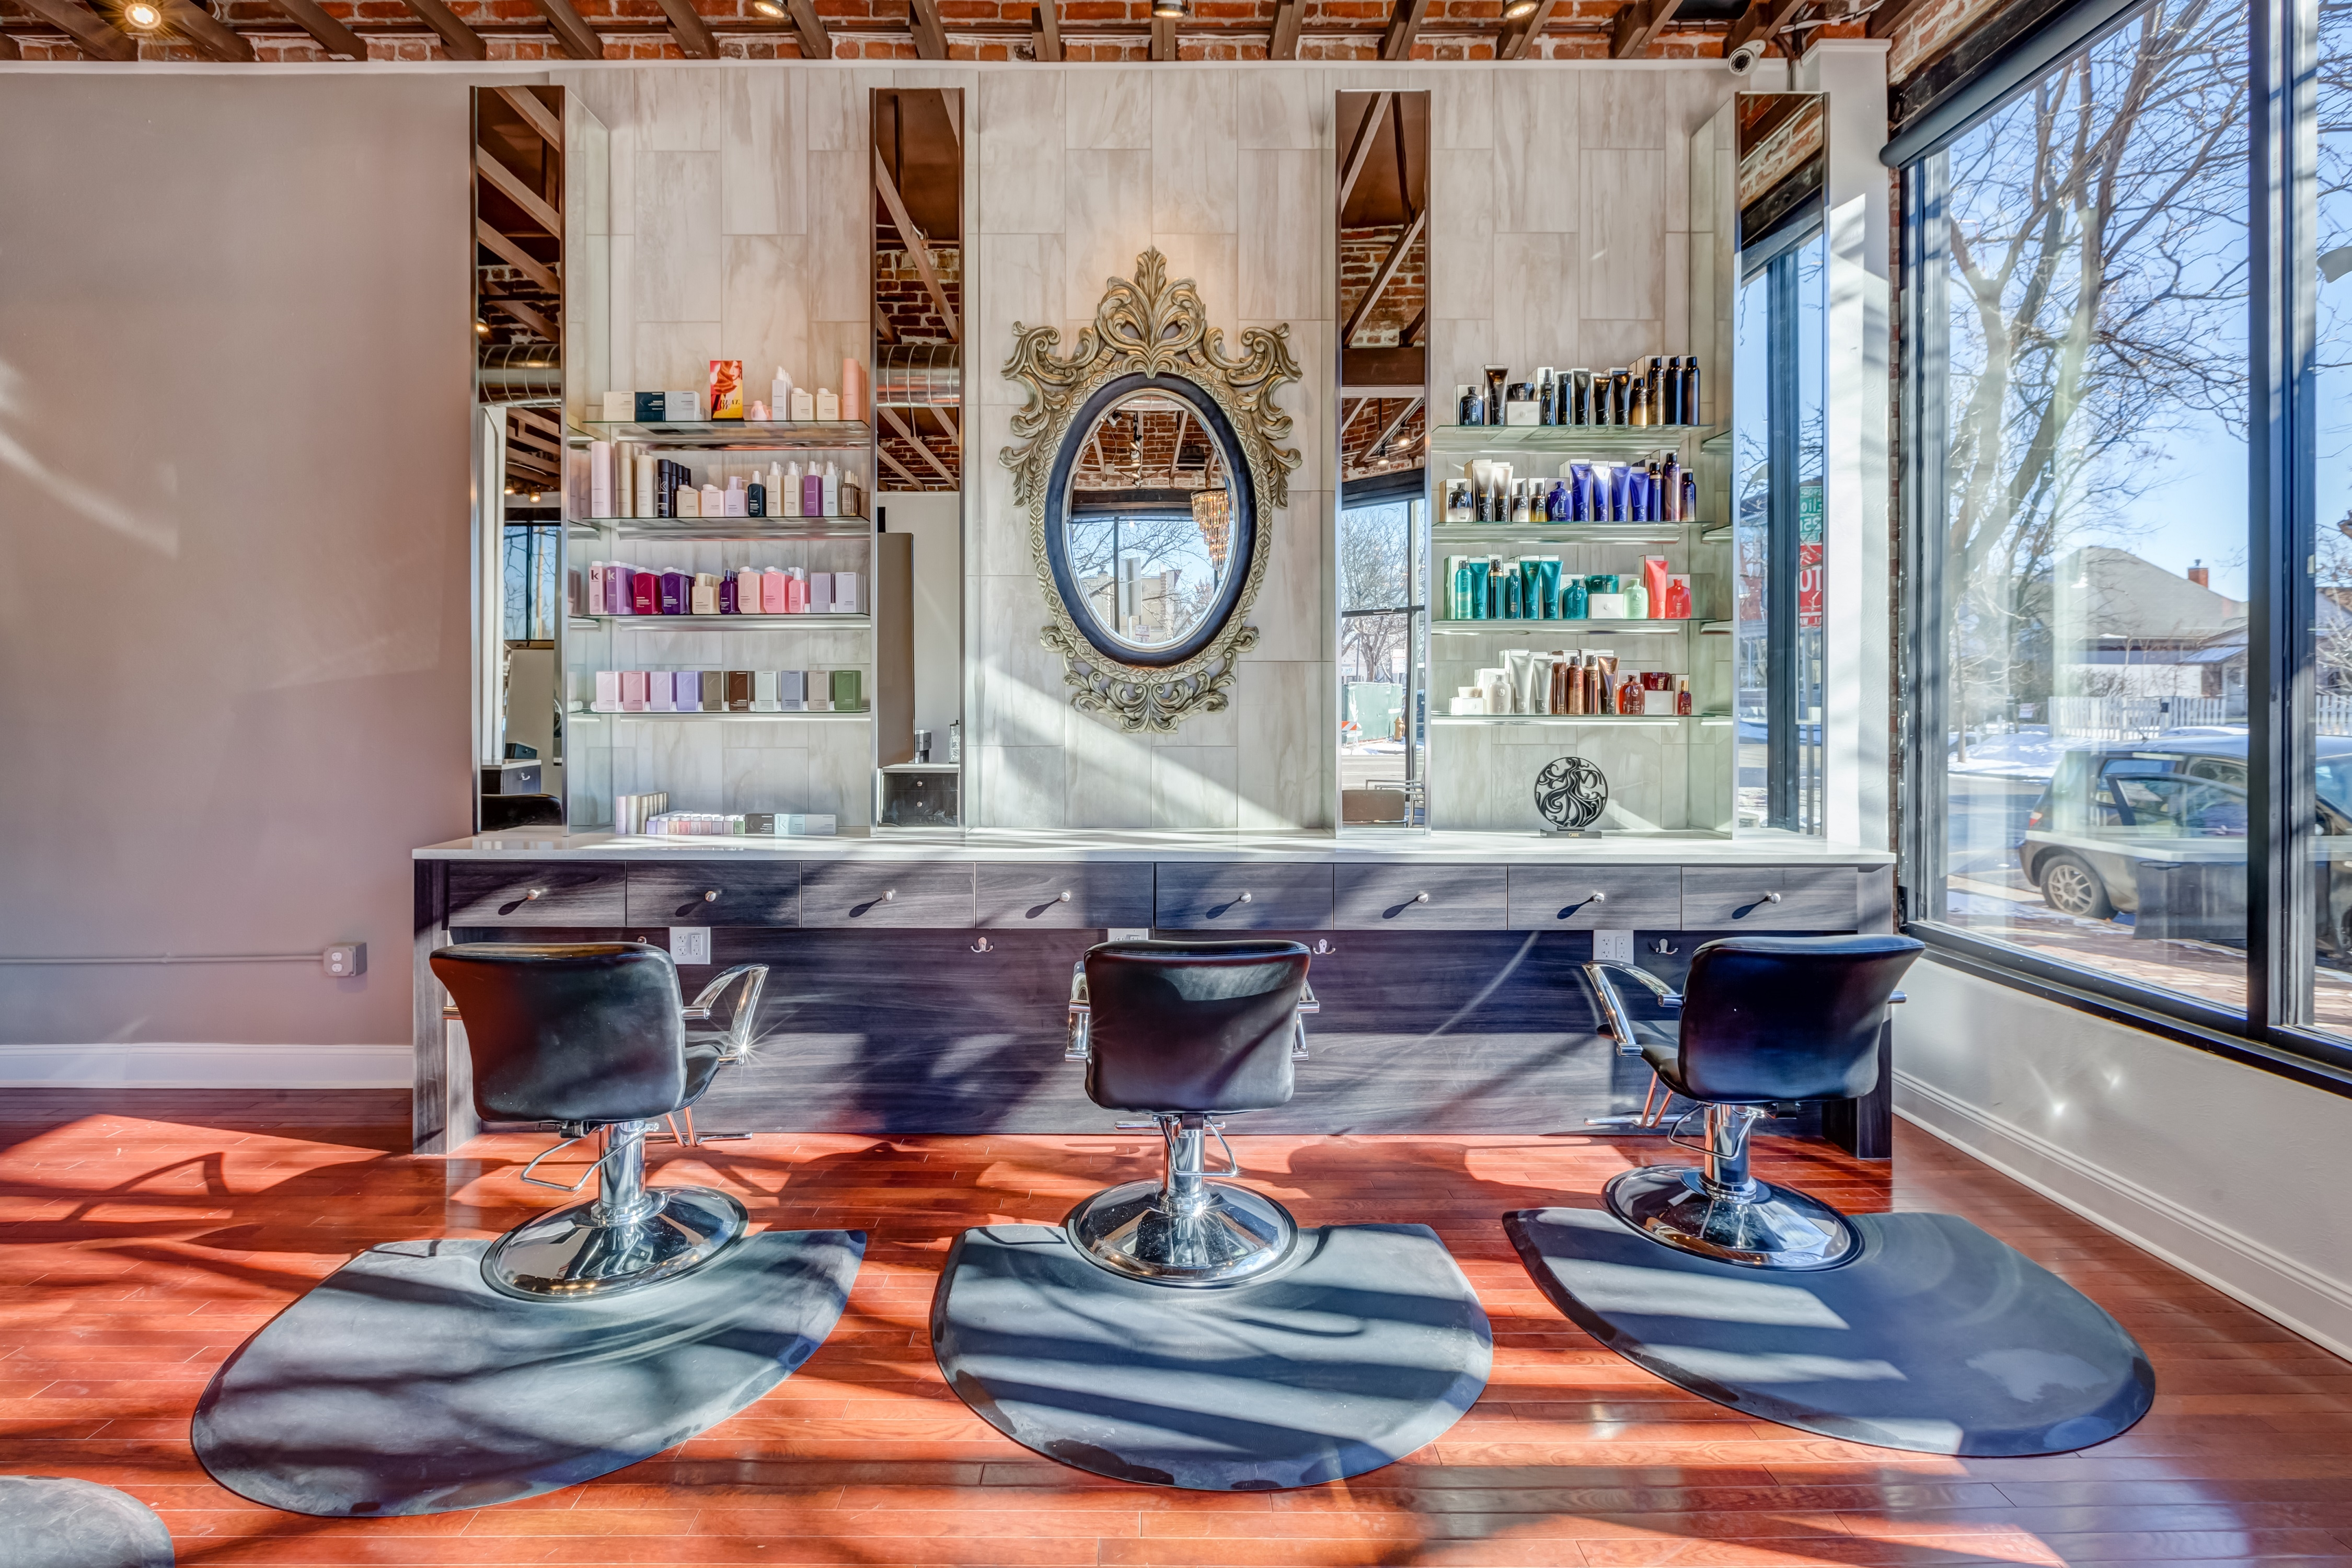 Deseo Salon & BlowDry image 3